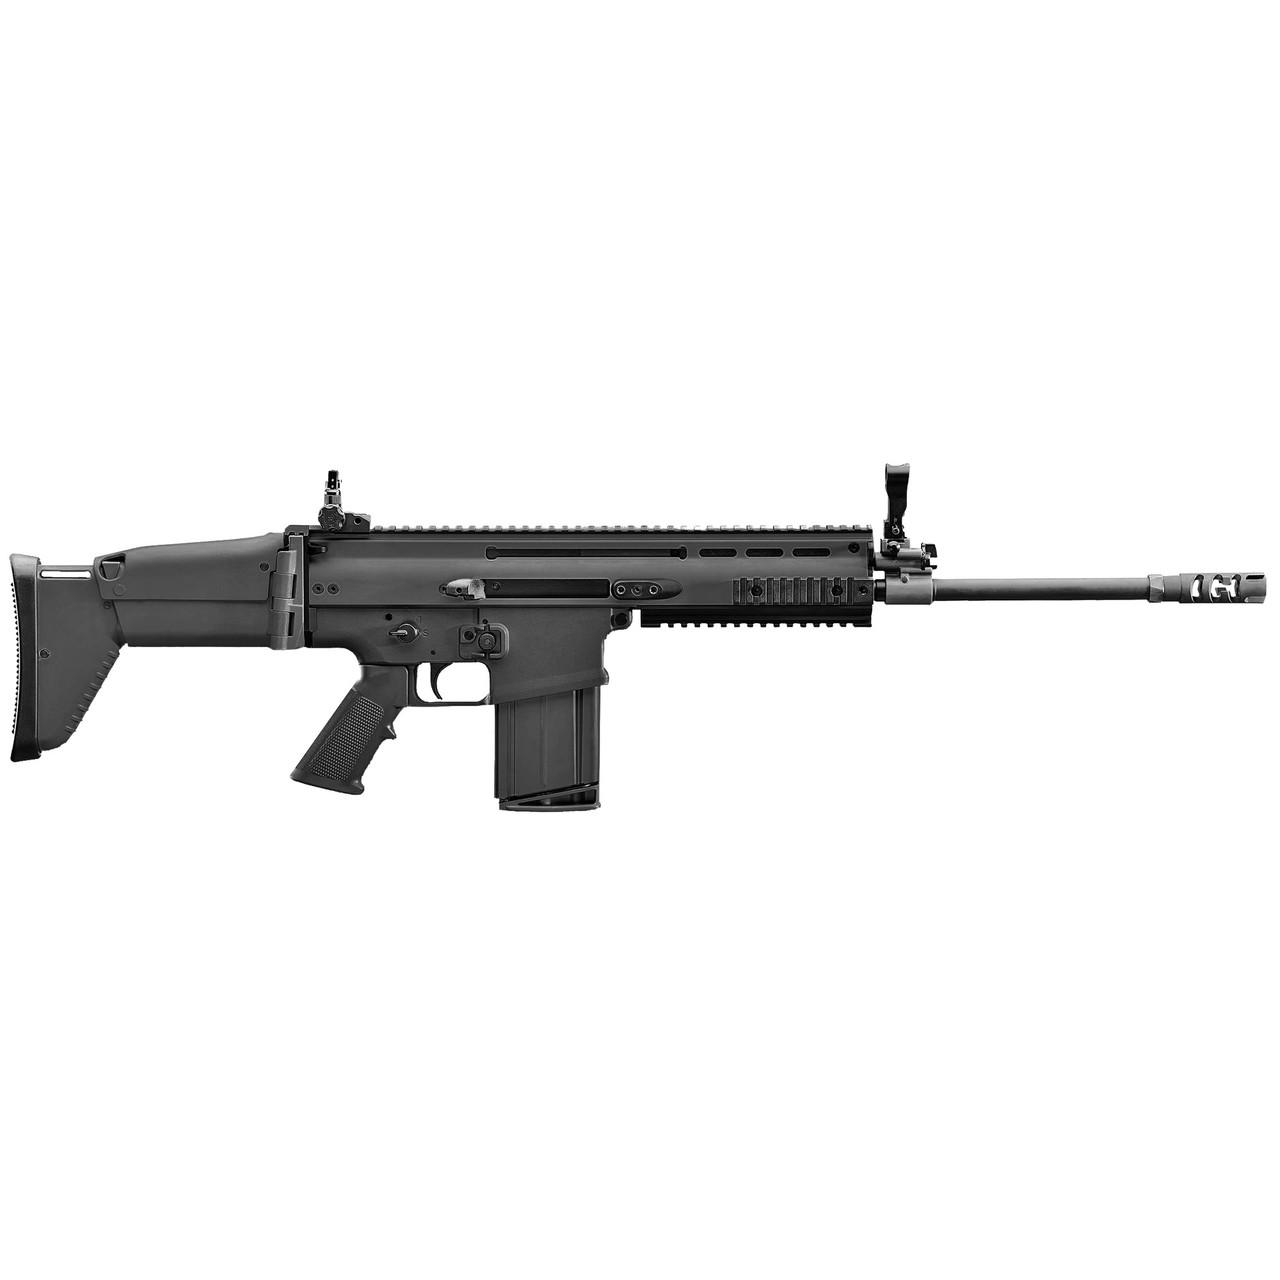 FNH SCAR 17S CALIFORNIA LEGAL .308win/7.62x51